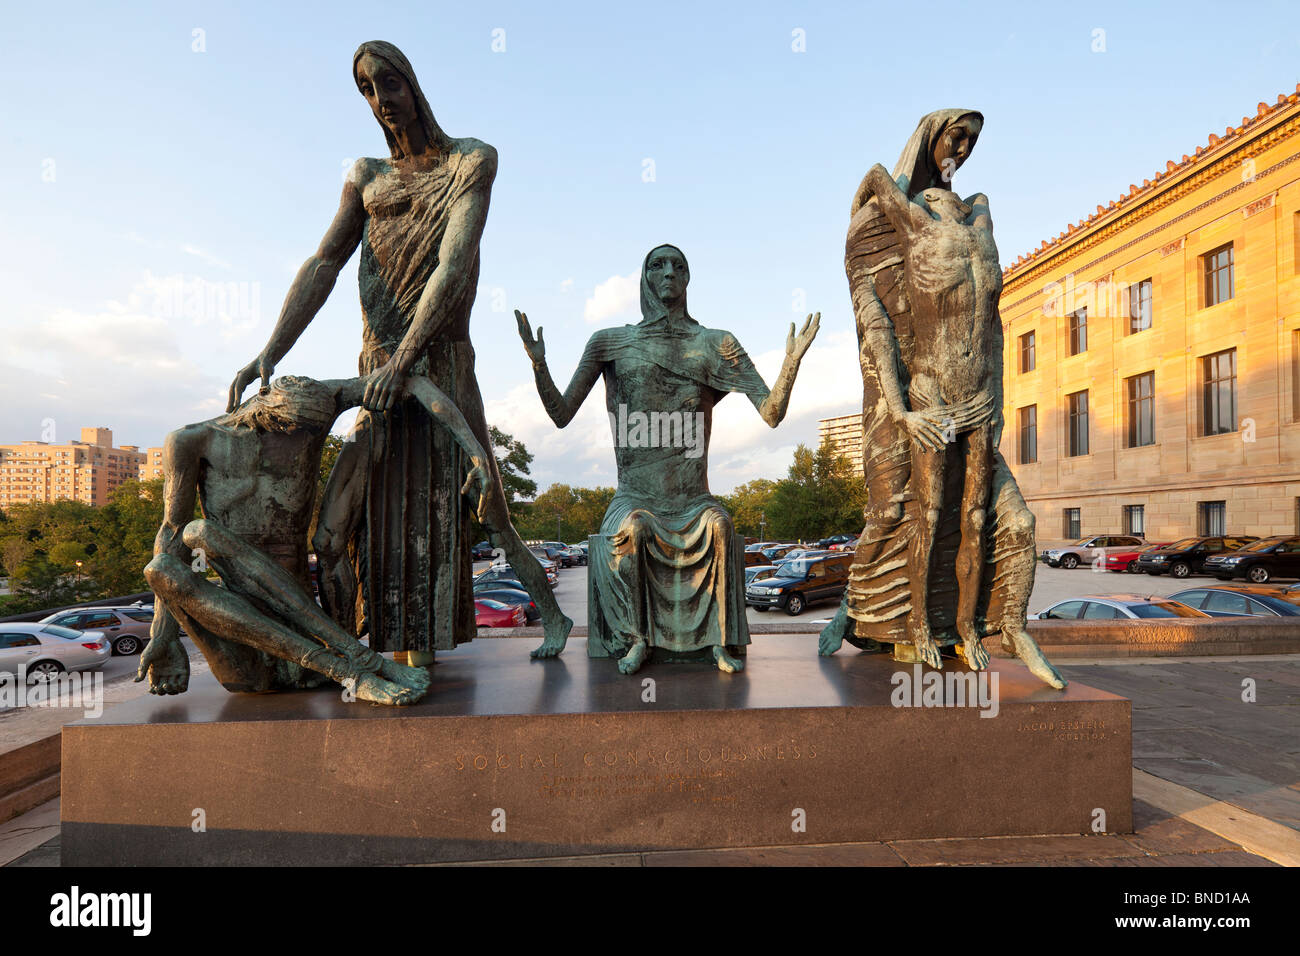 Statue of 'Social Consciousness' by Jacob Epstein, 1954, Philadelphia Museum of Art, Pennsylvania, USA - Stock Image